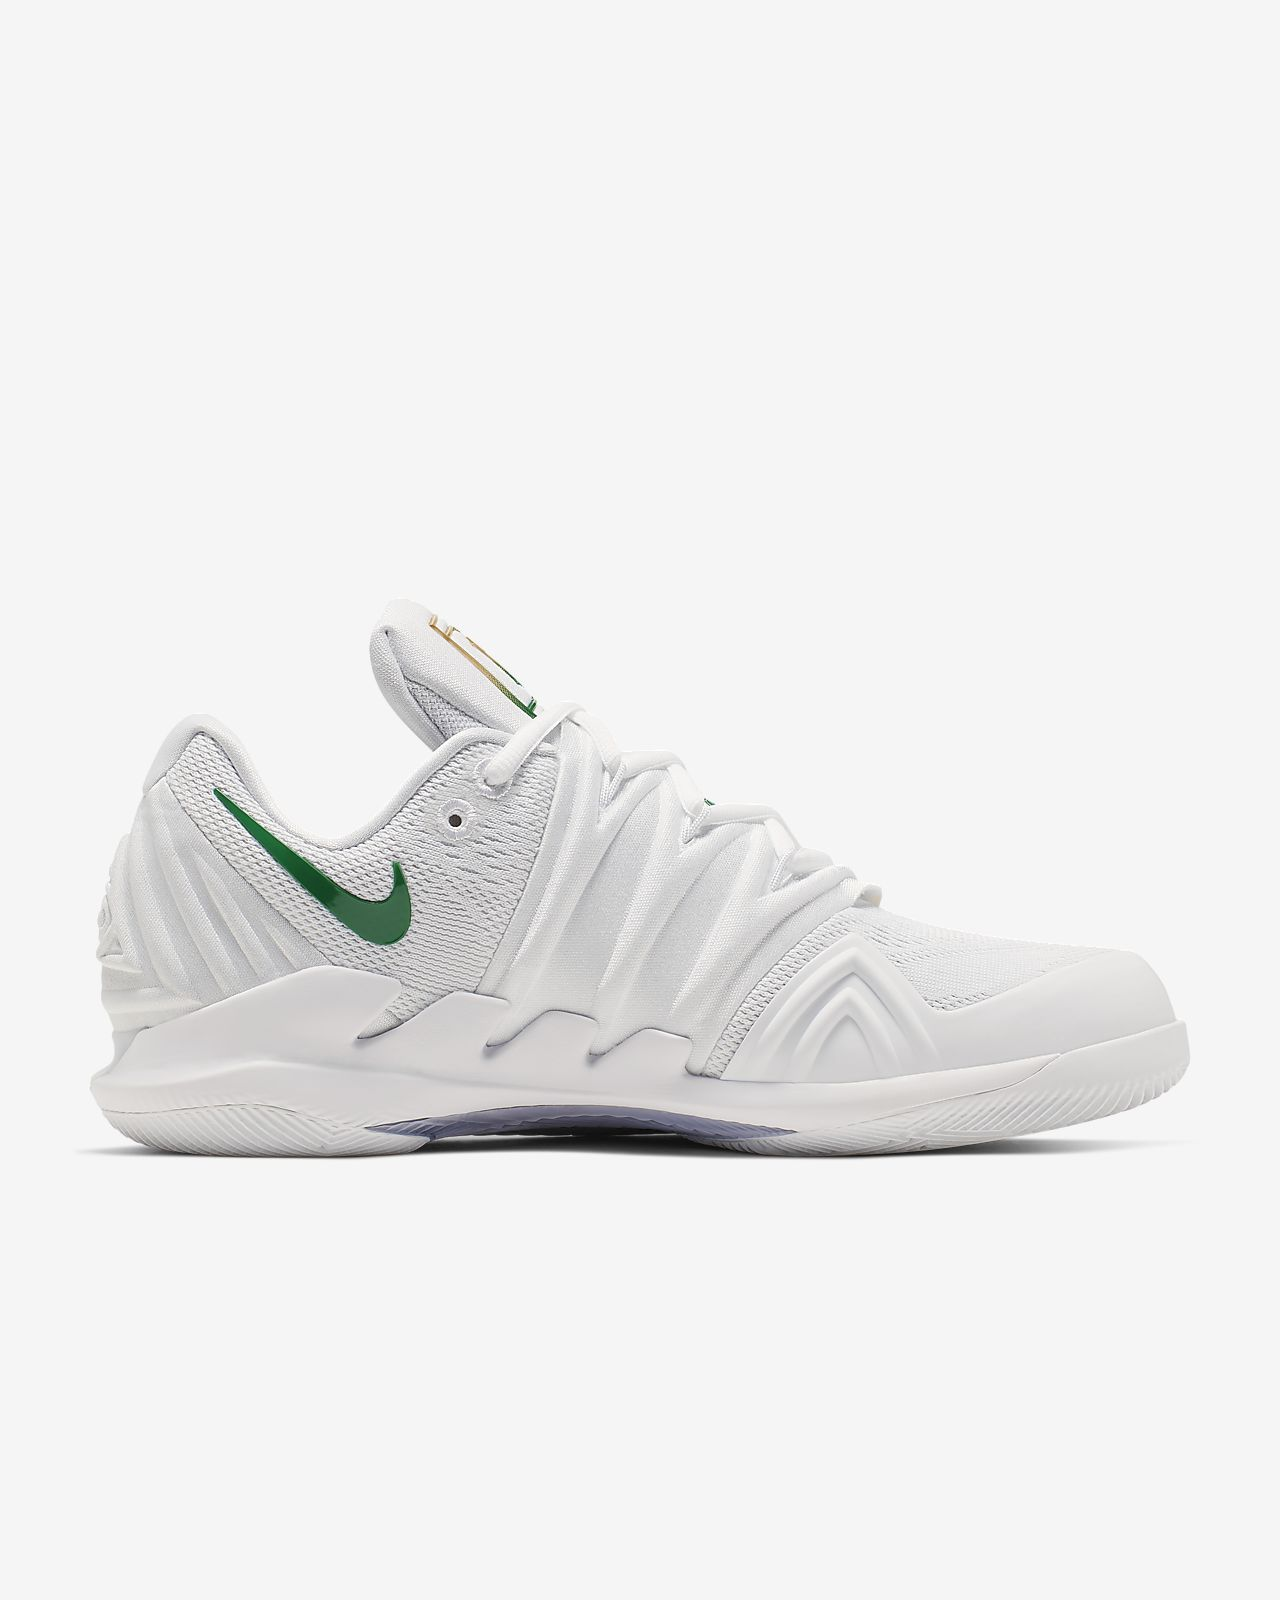 08877a52 NikeCourt Air Zoom Vapor X Kyrie 5 Men's Hard Court Tennis Shoe